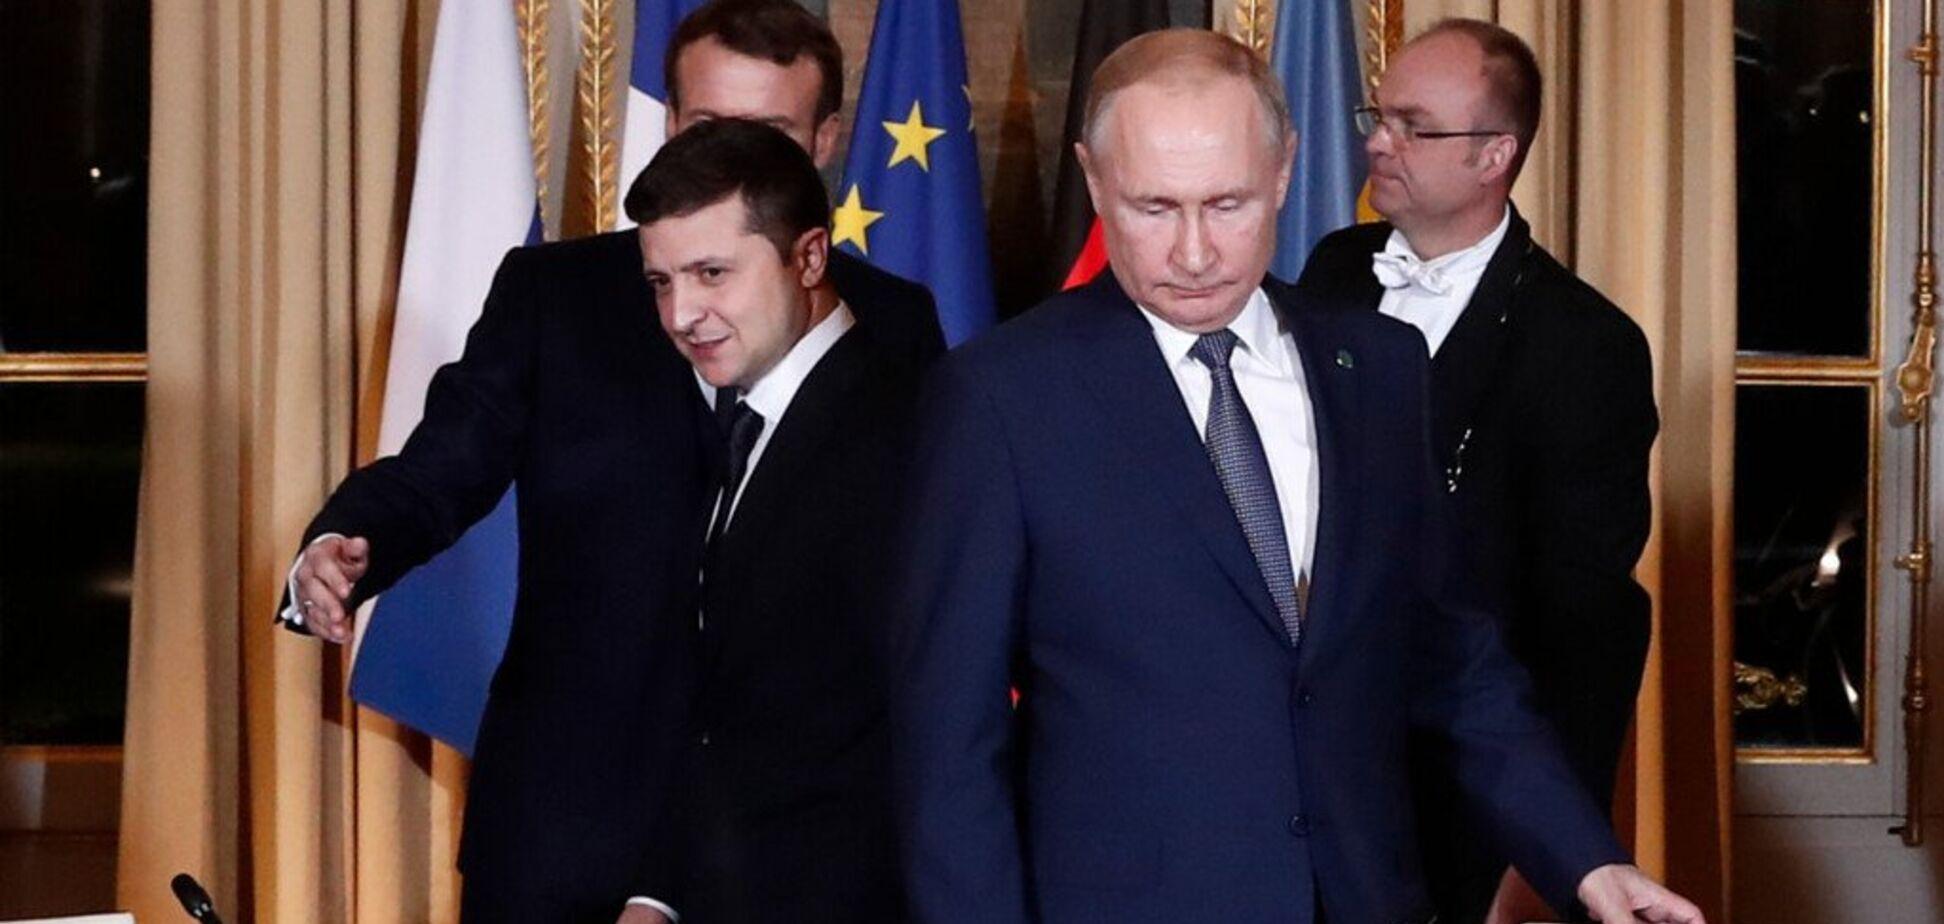 Зеленский стал популярнее Путина